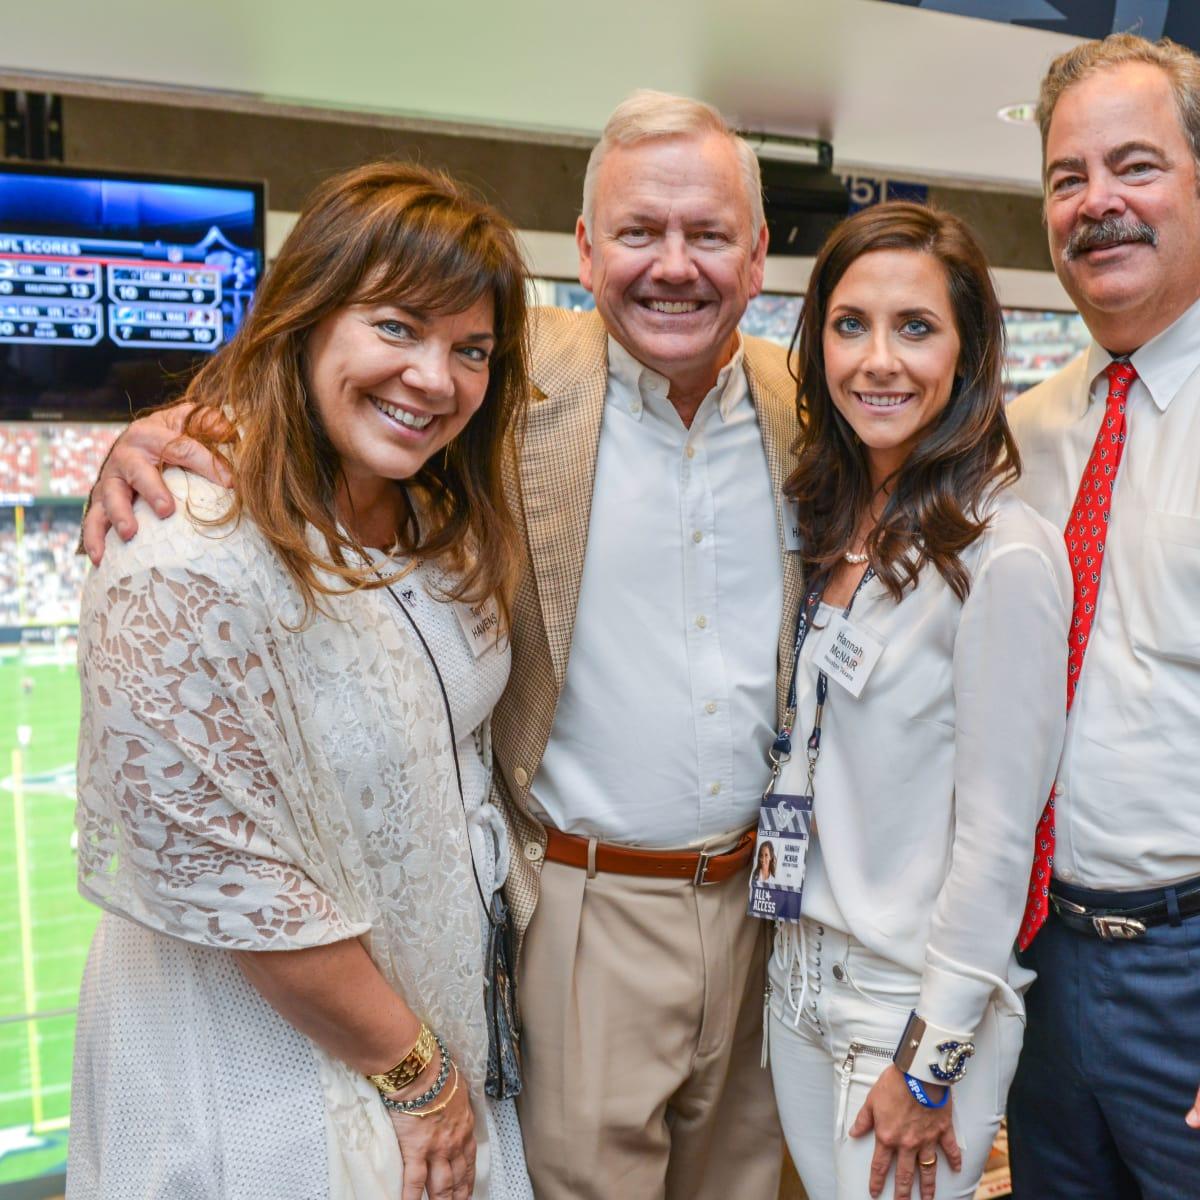 News, Shelby, Texans Owners suite, Sept. 2015, Terri and John Havens, Hannah McNair, Cal McNair